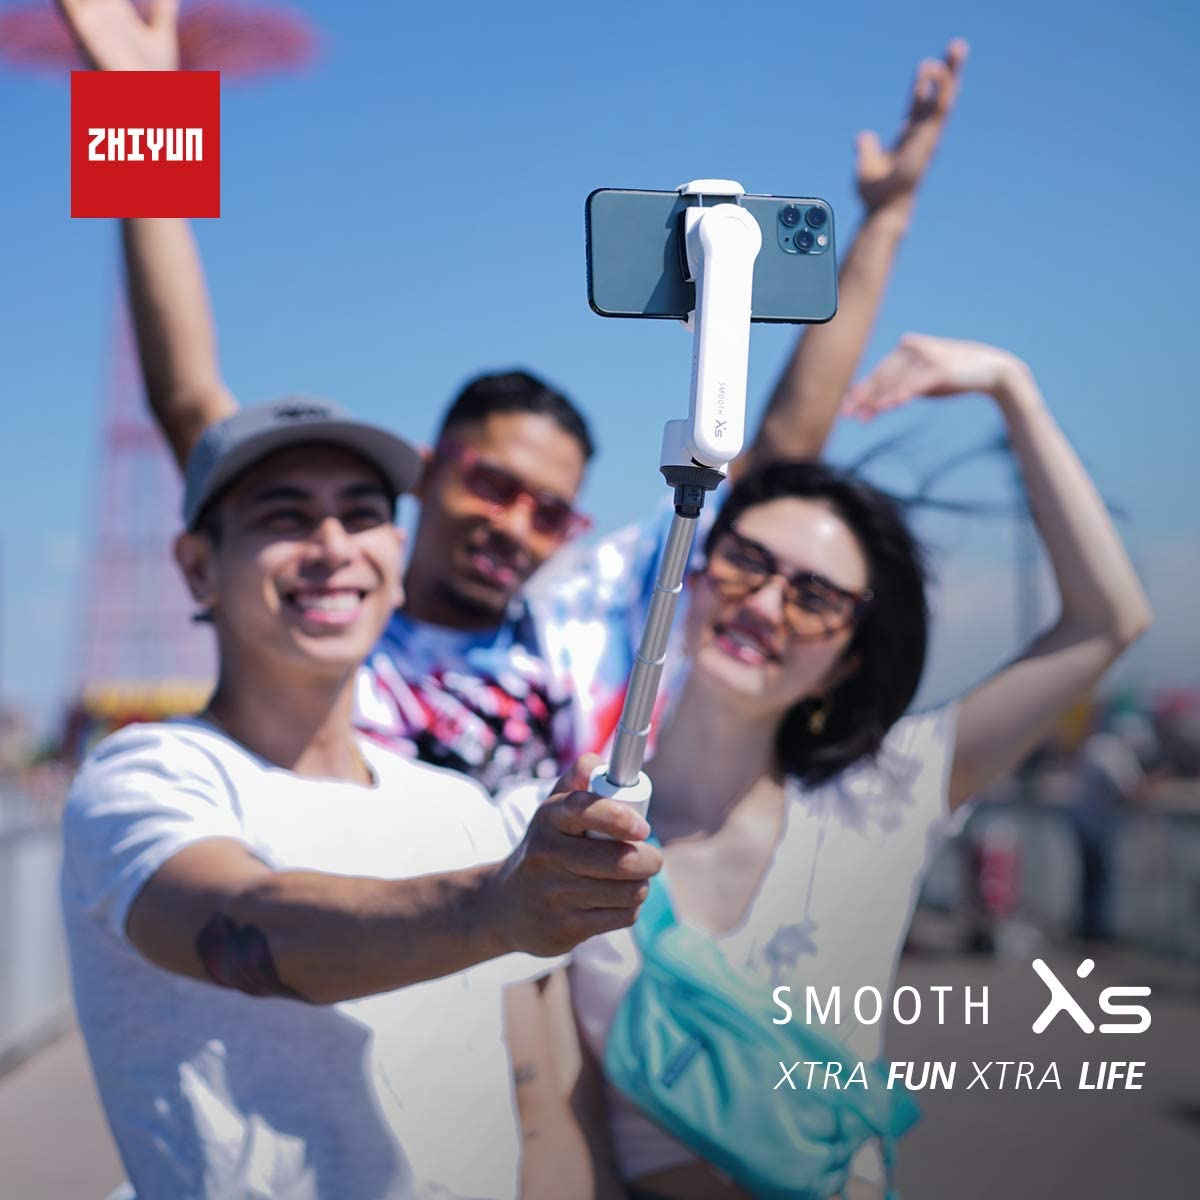 White Zhiyun Smooth-XS Gimbal Stabilizer